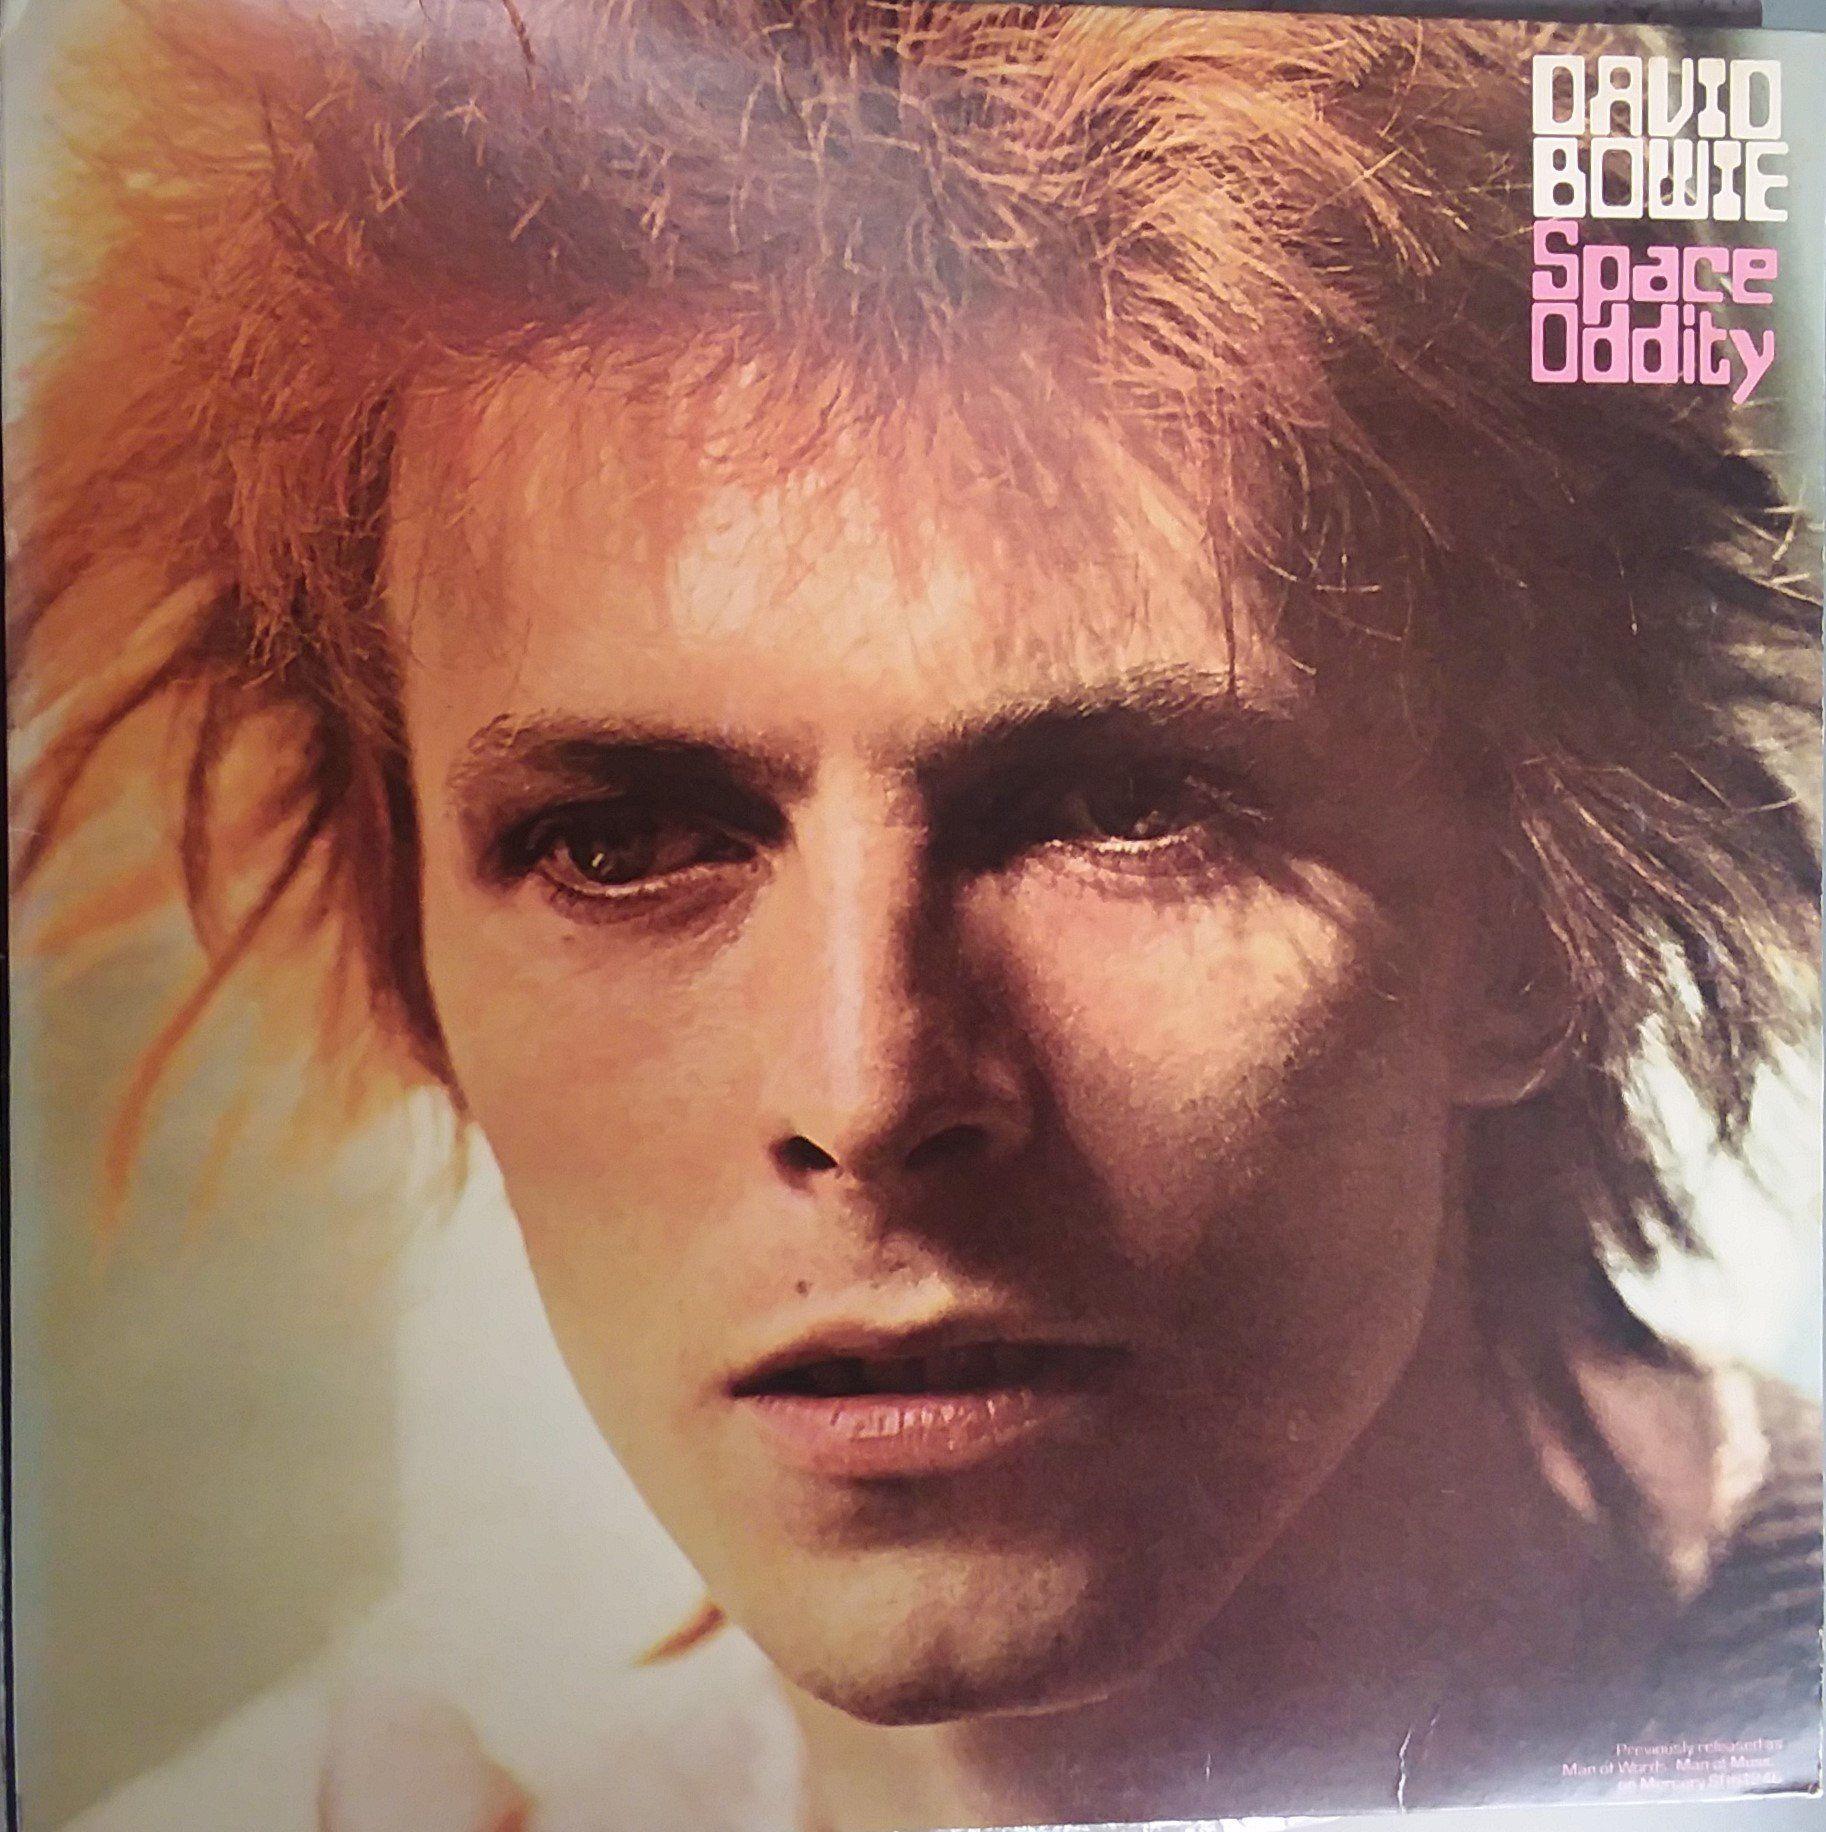 David Bowie Space Oddity Vintage Record Album Vinyl Lp Classic